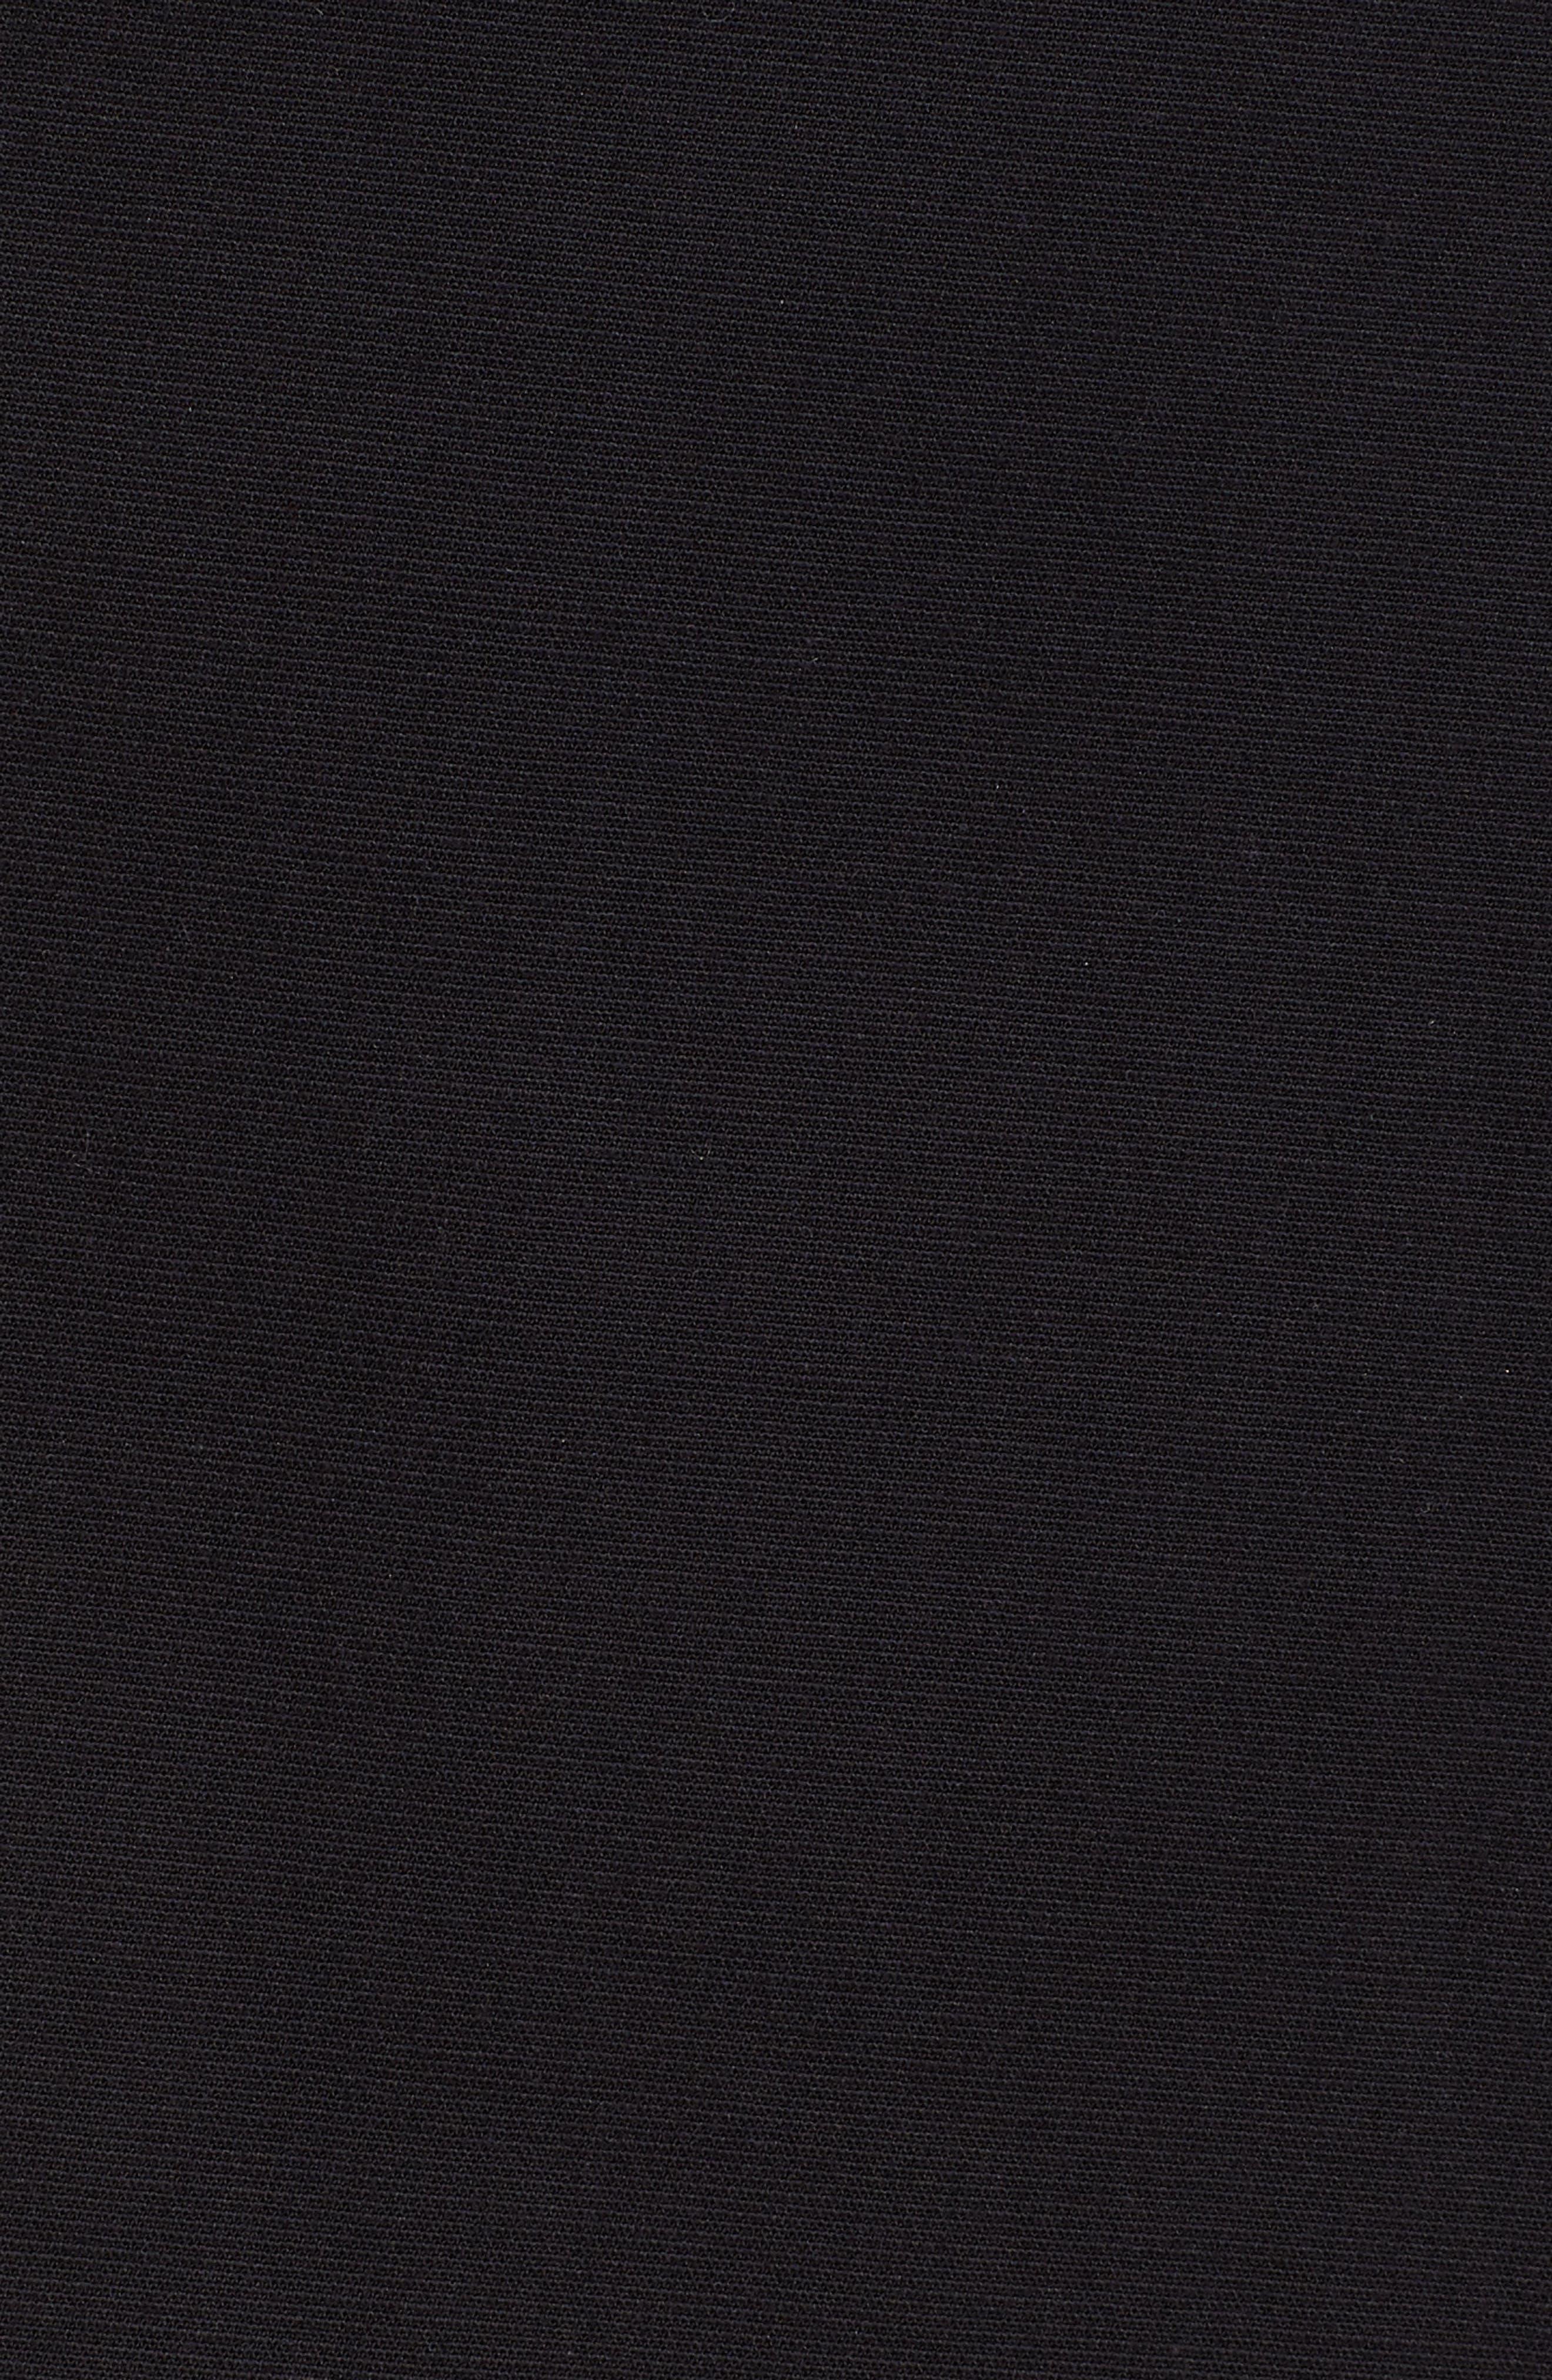 A.L.C., Aldridge Belted Midi Skirt, Alternate thumbnail 5, color, VINTAGE BLACK